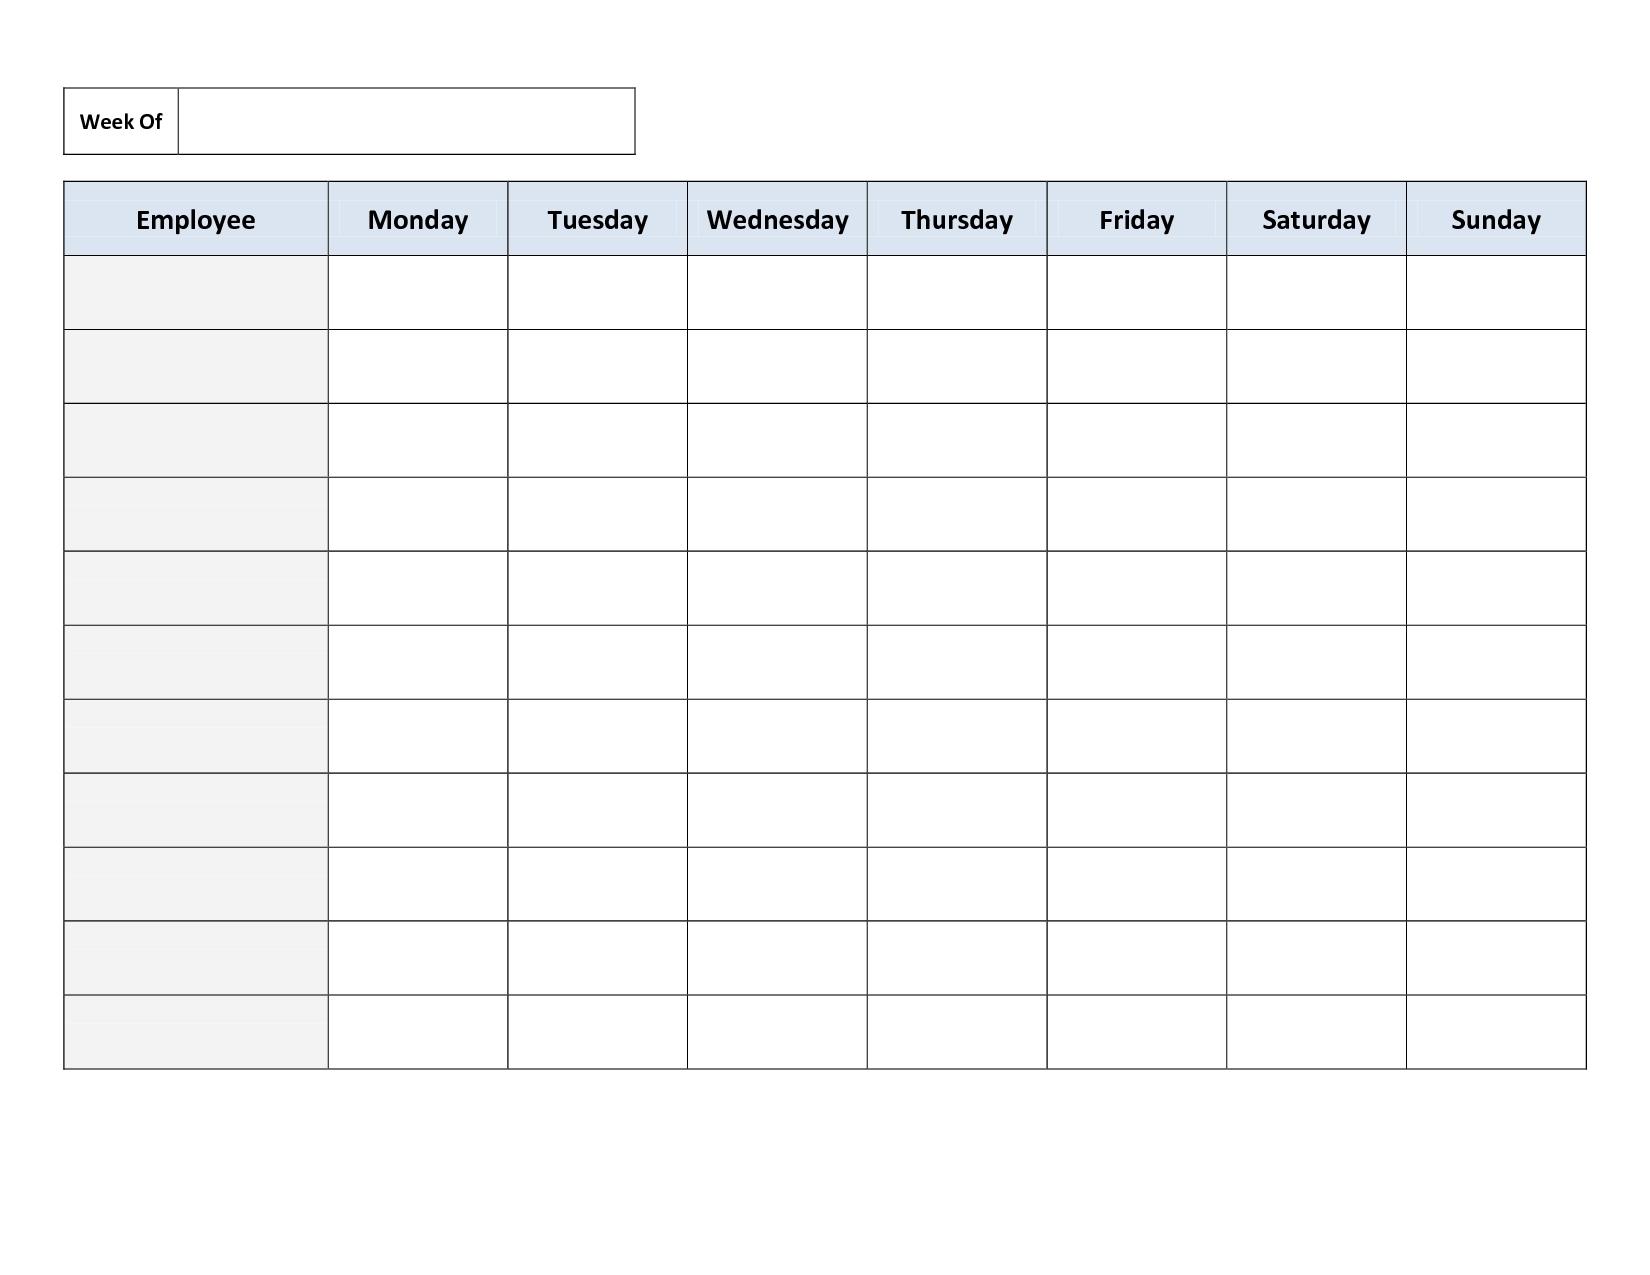 Blank Weekly Work Schedule Template | Timetable Template-Monday To Friday Timetable Template